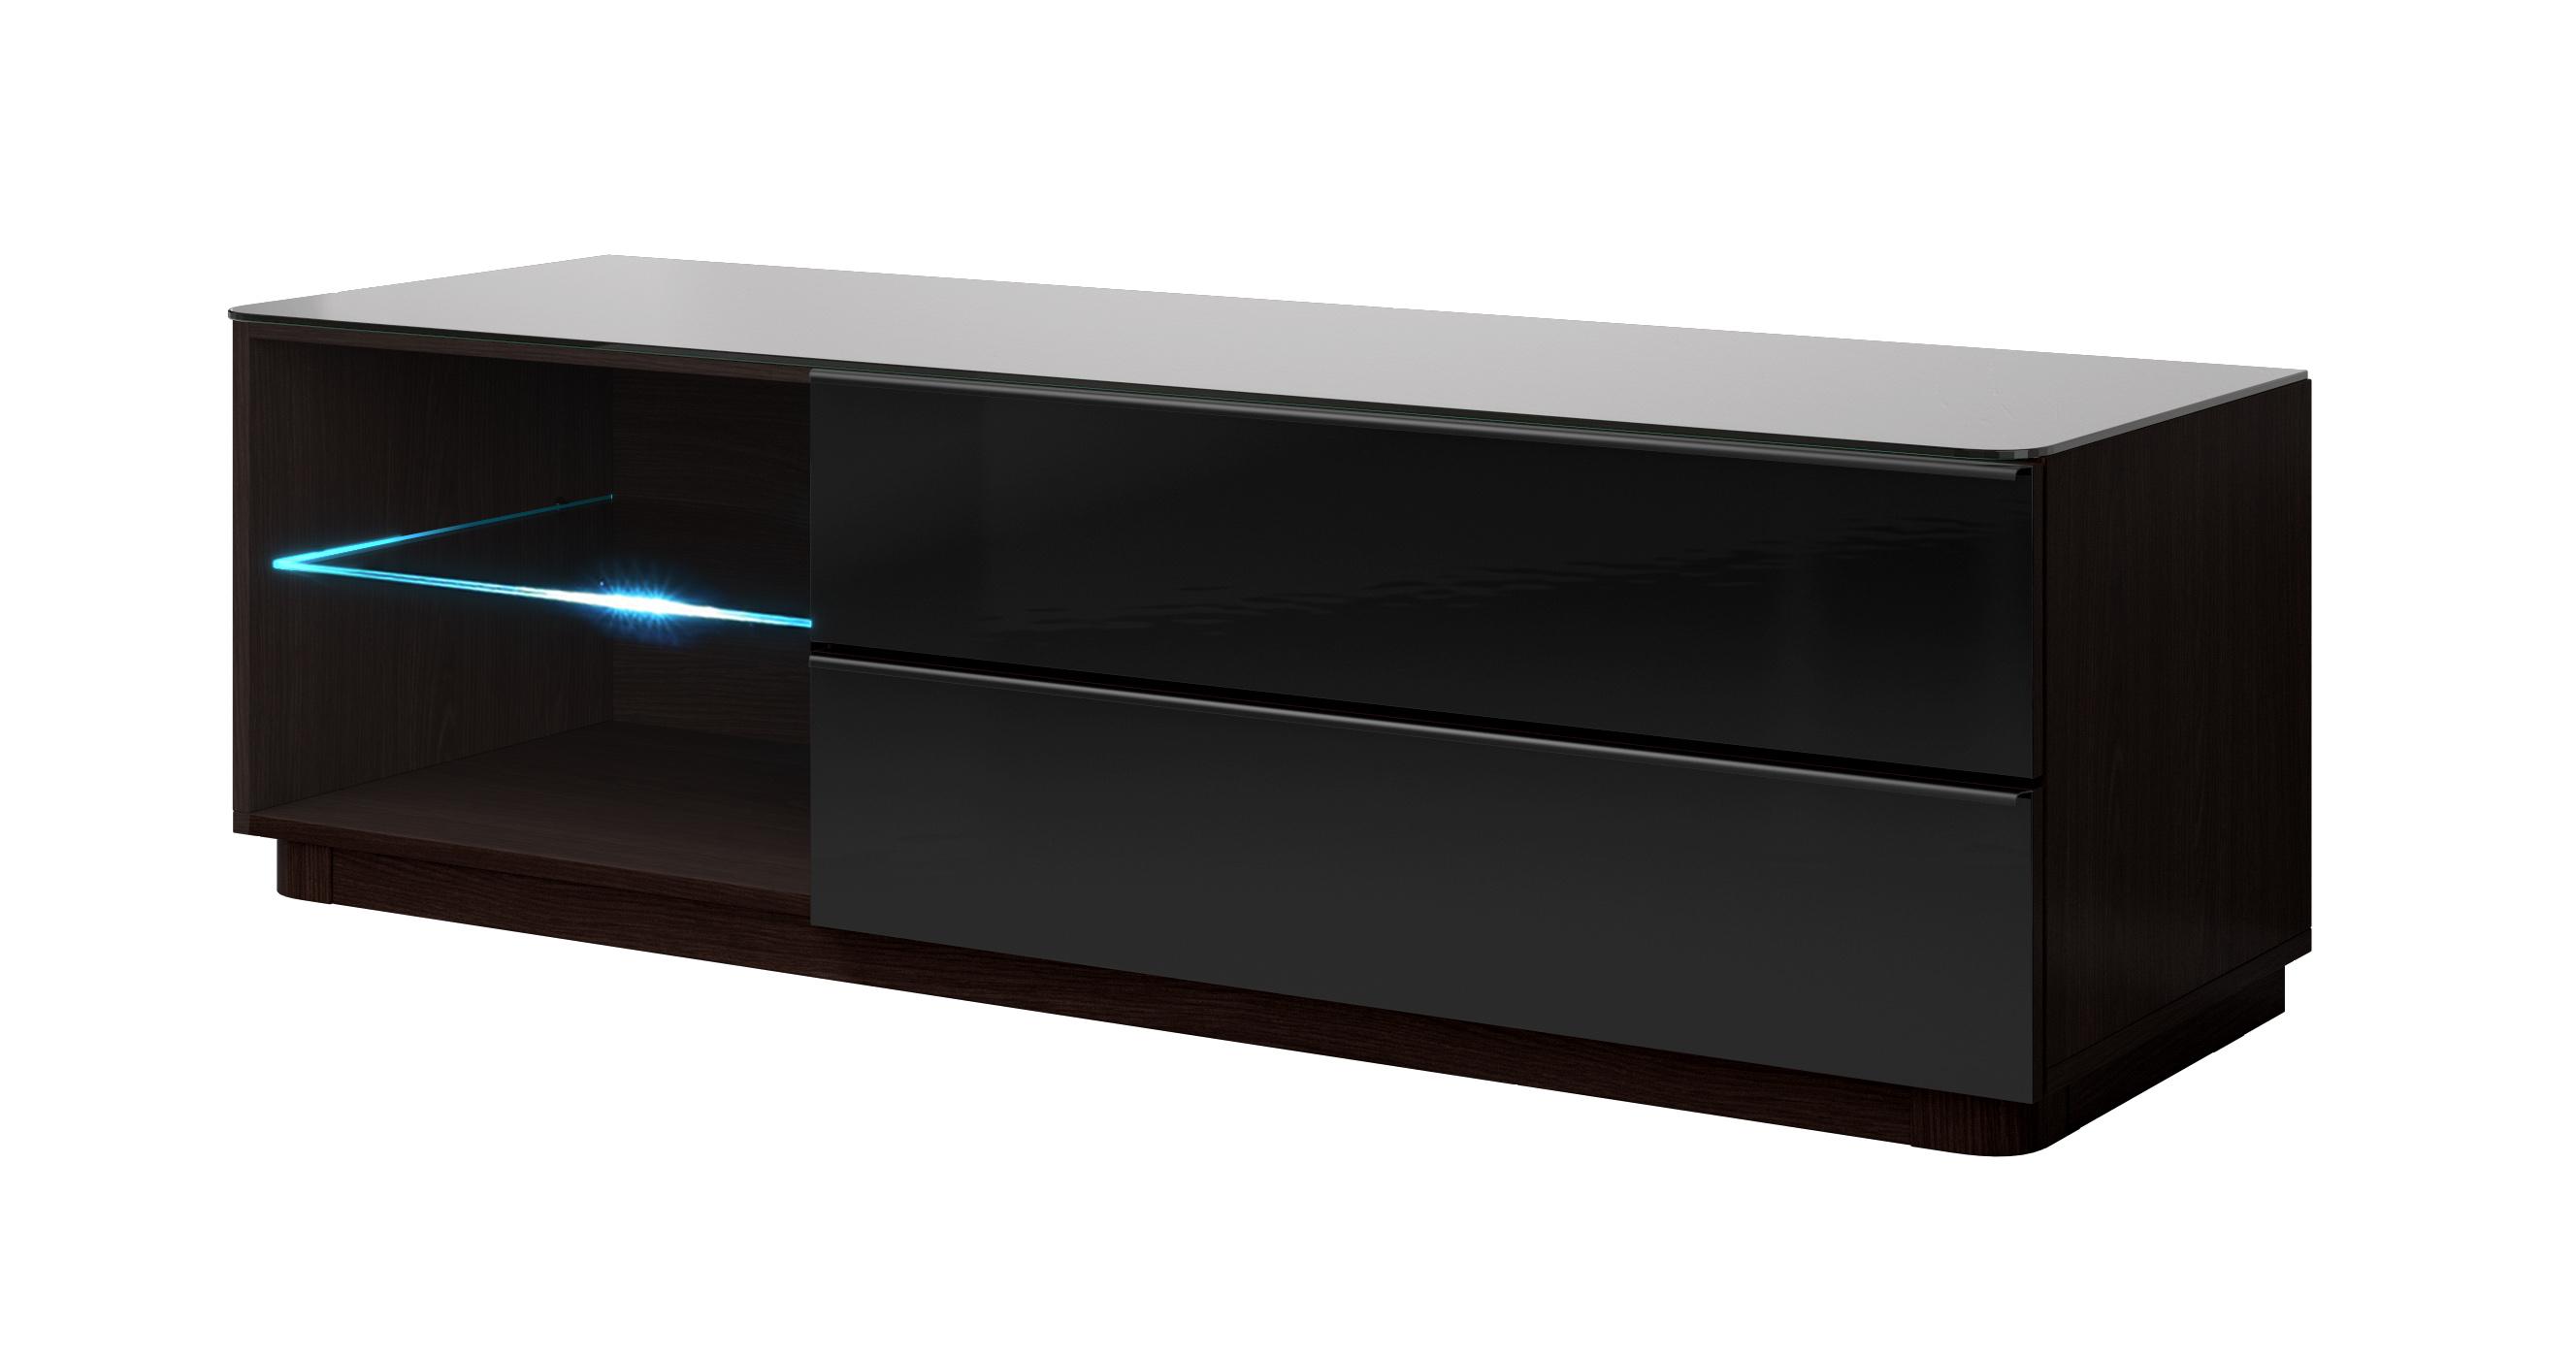 TV stolek/skříňka - Toft - Typ 40 (wenge + černé sklo)